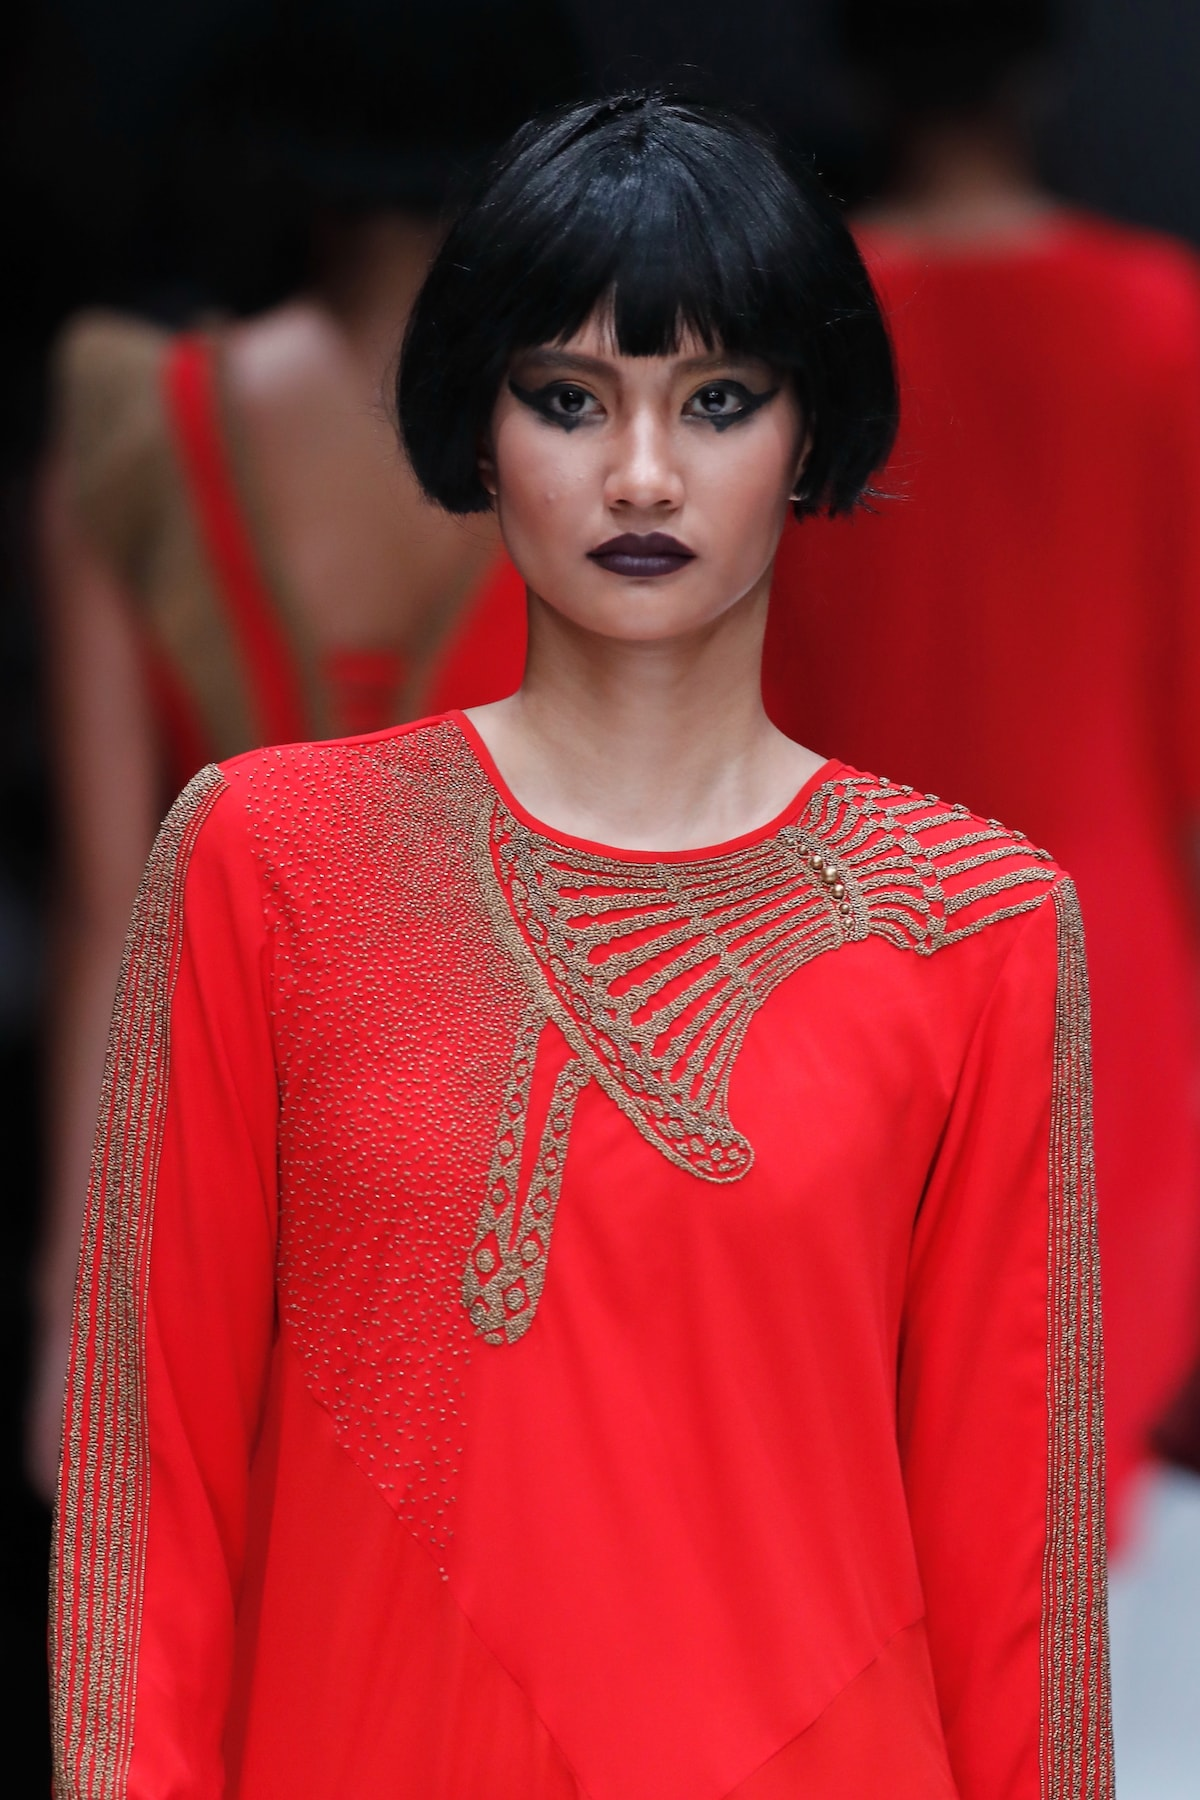 Wanita asia dengan model rambut bob untuk rambut tipis.